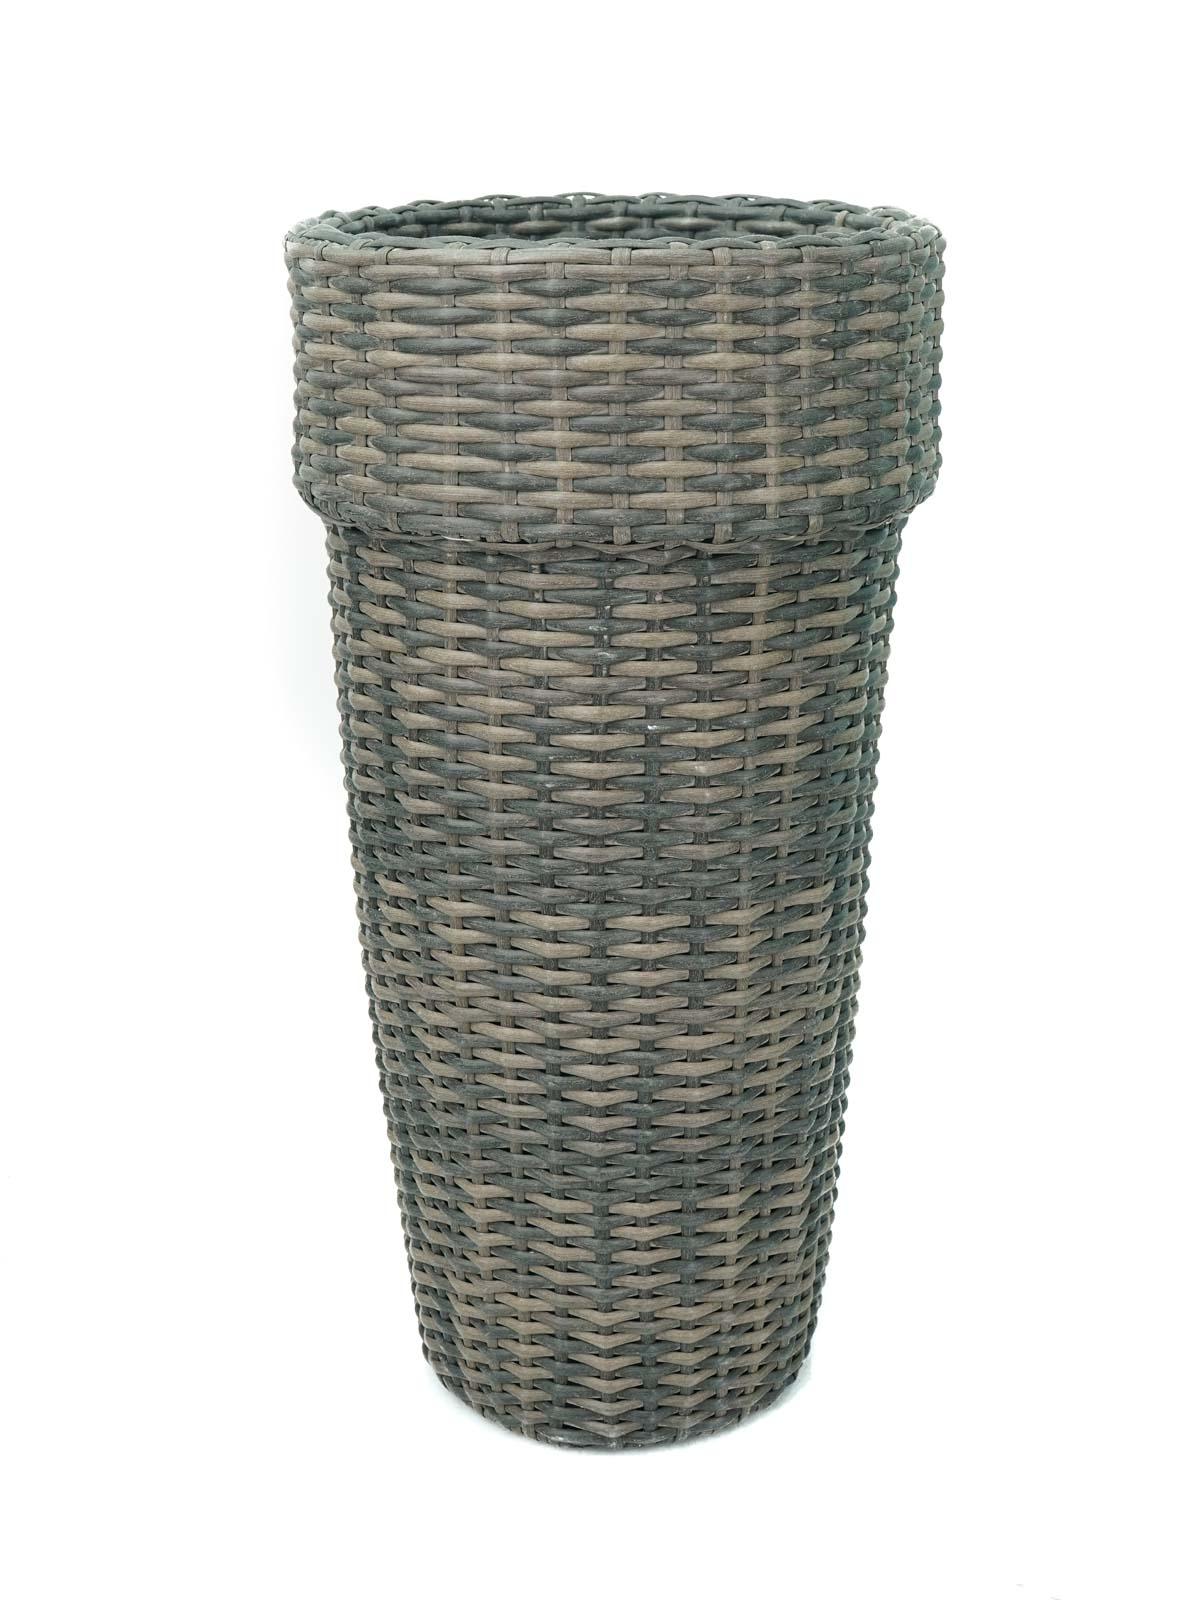 Vase Bali 'Pots & Vases'